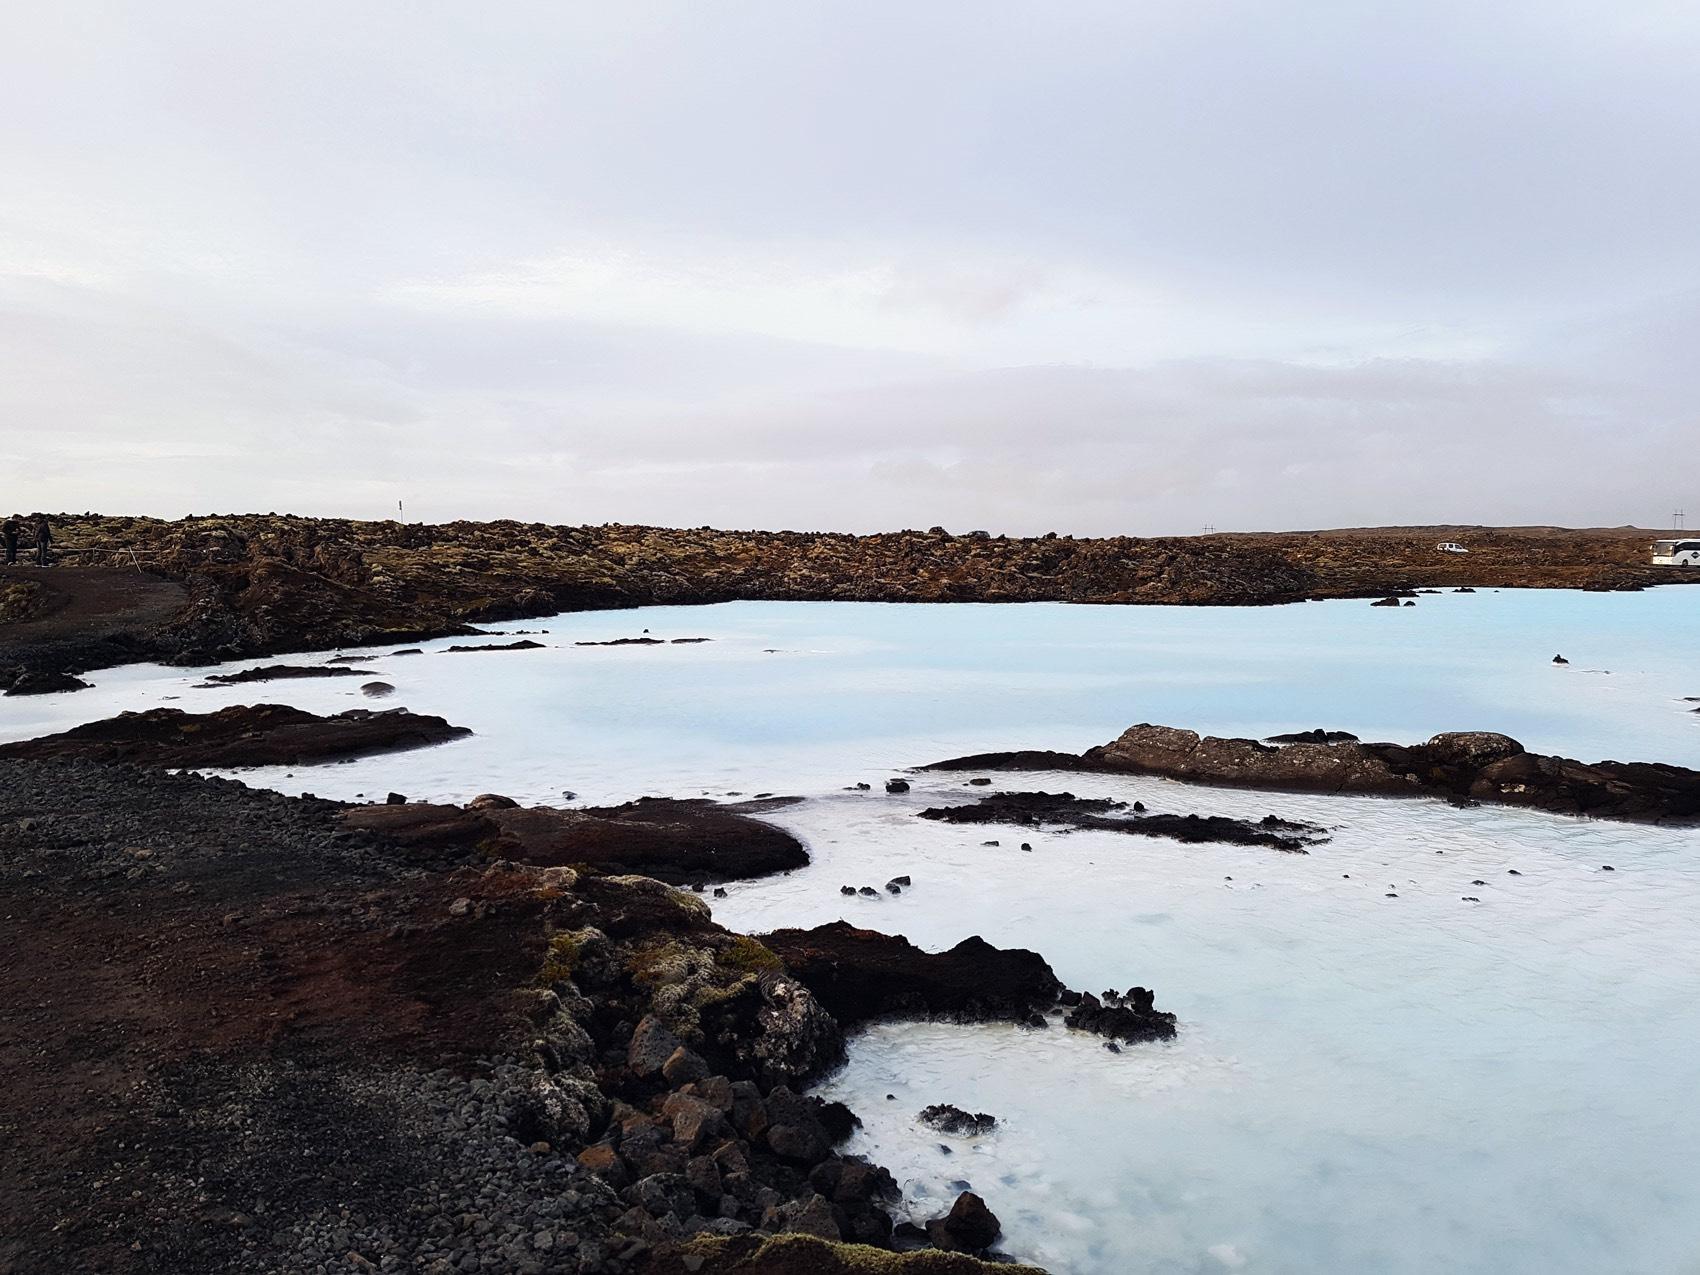 wasser-blaue-lagoone-island-iceland-hot-spots-nina-fashiioncarpet_Fotor